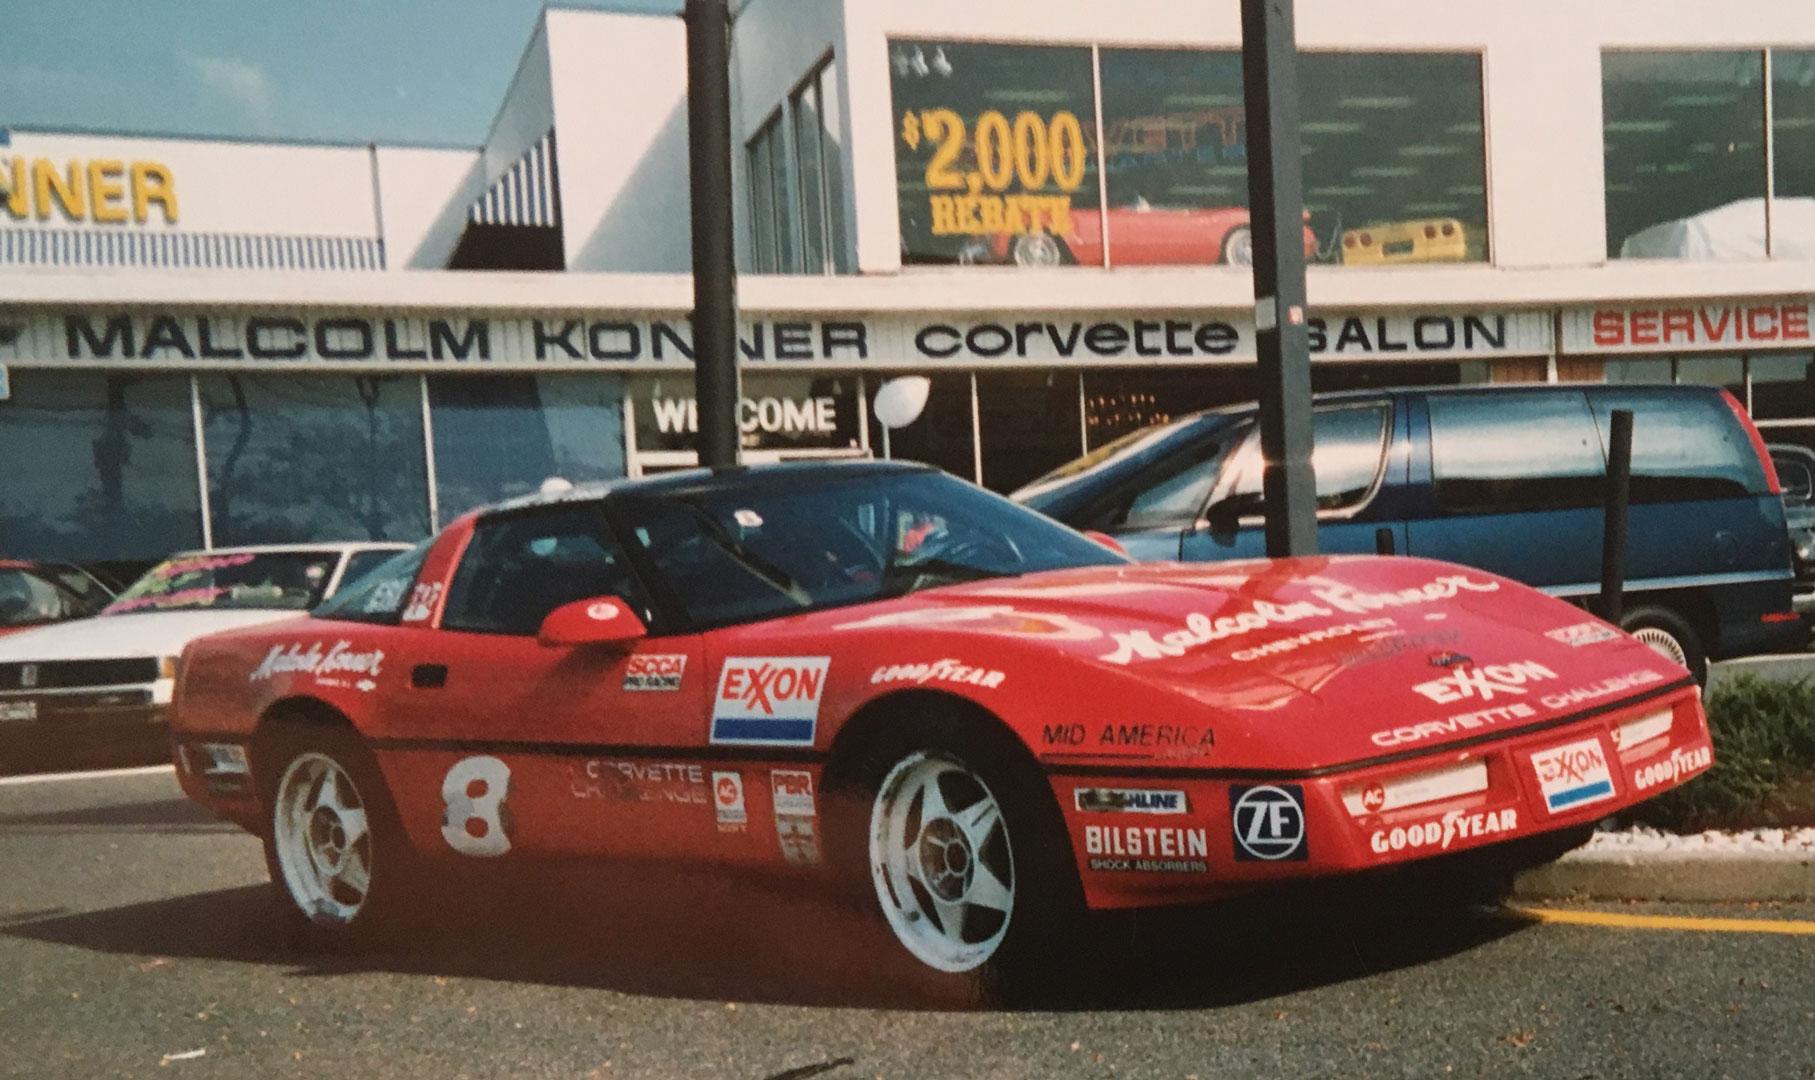 Mark Wolocatiuk (#8) also had sponsorship from Malcolm Konner Chevrolet.